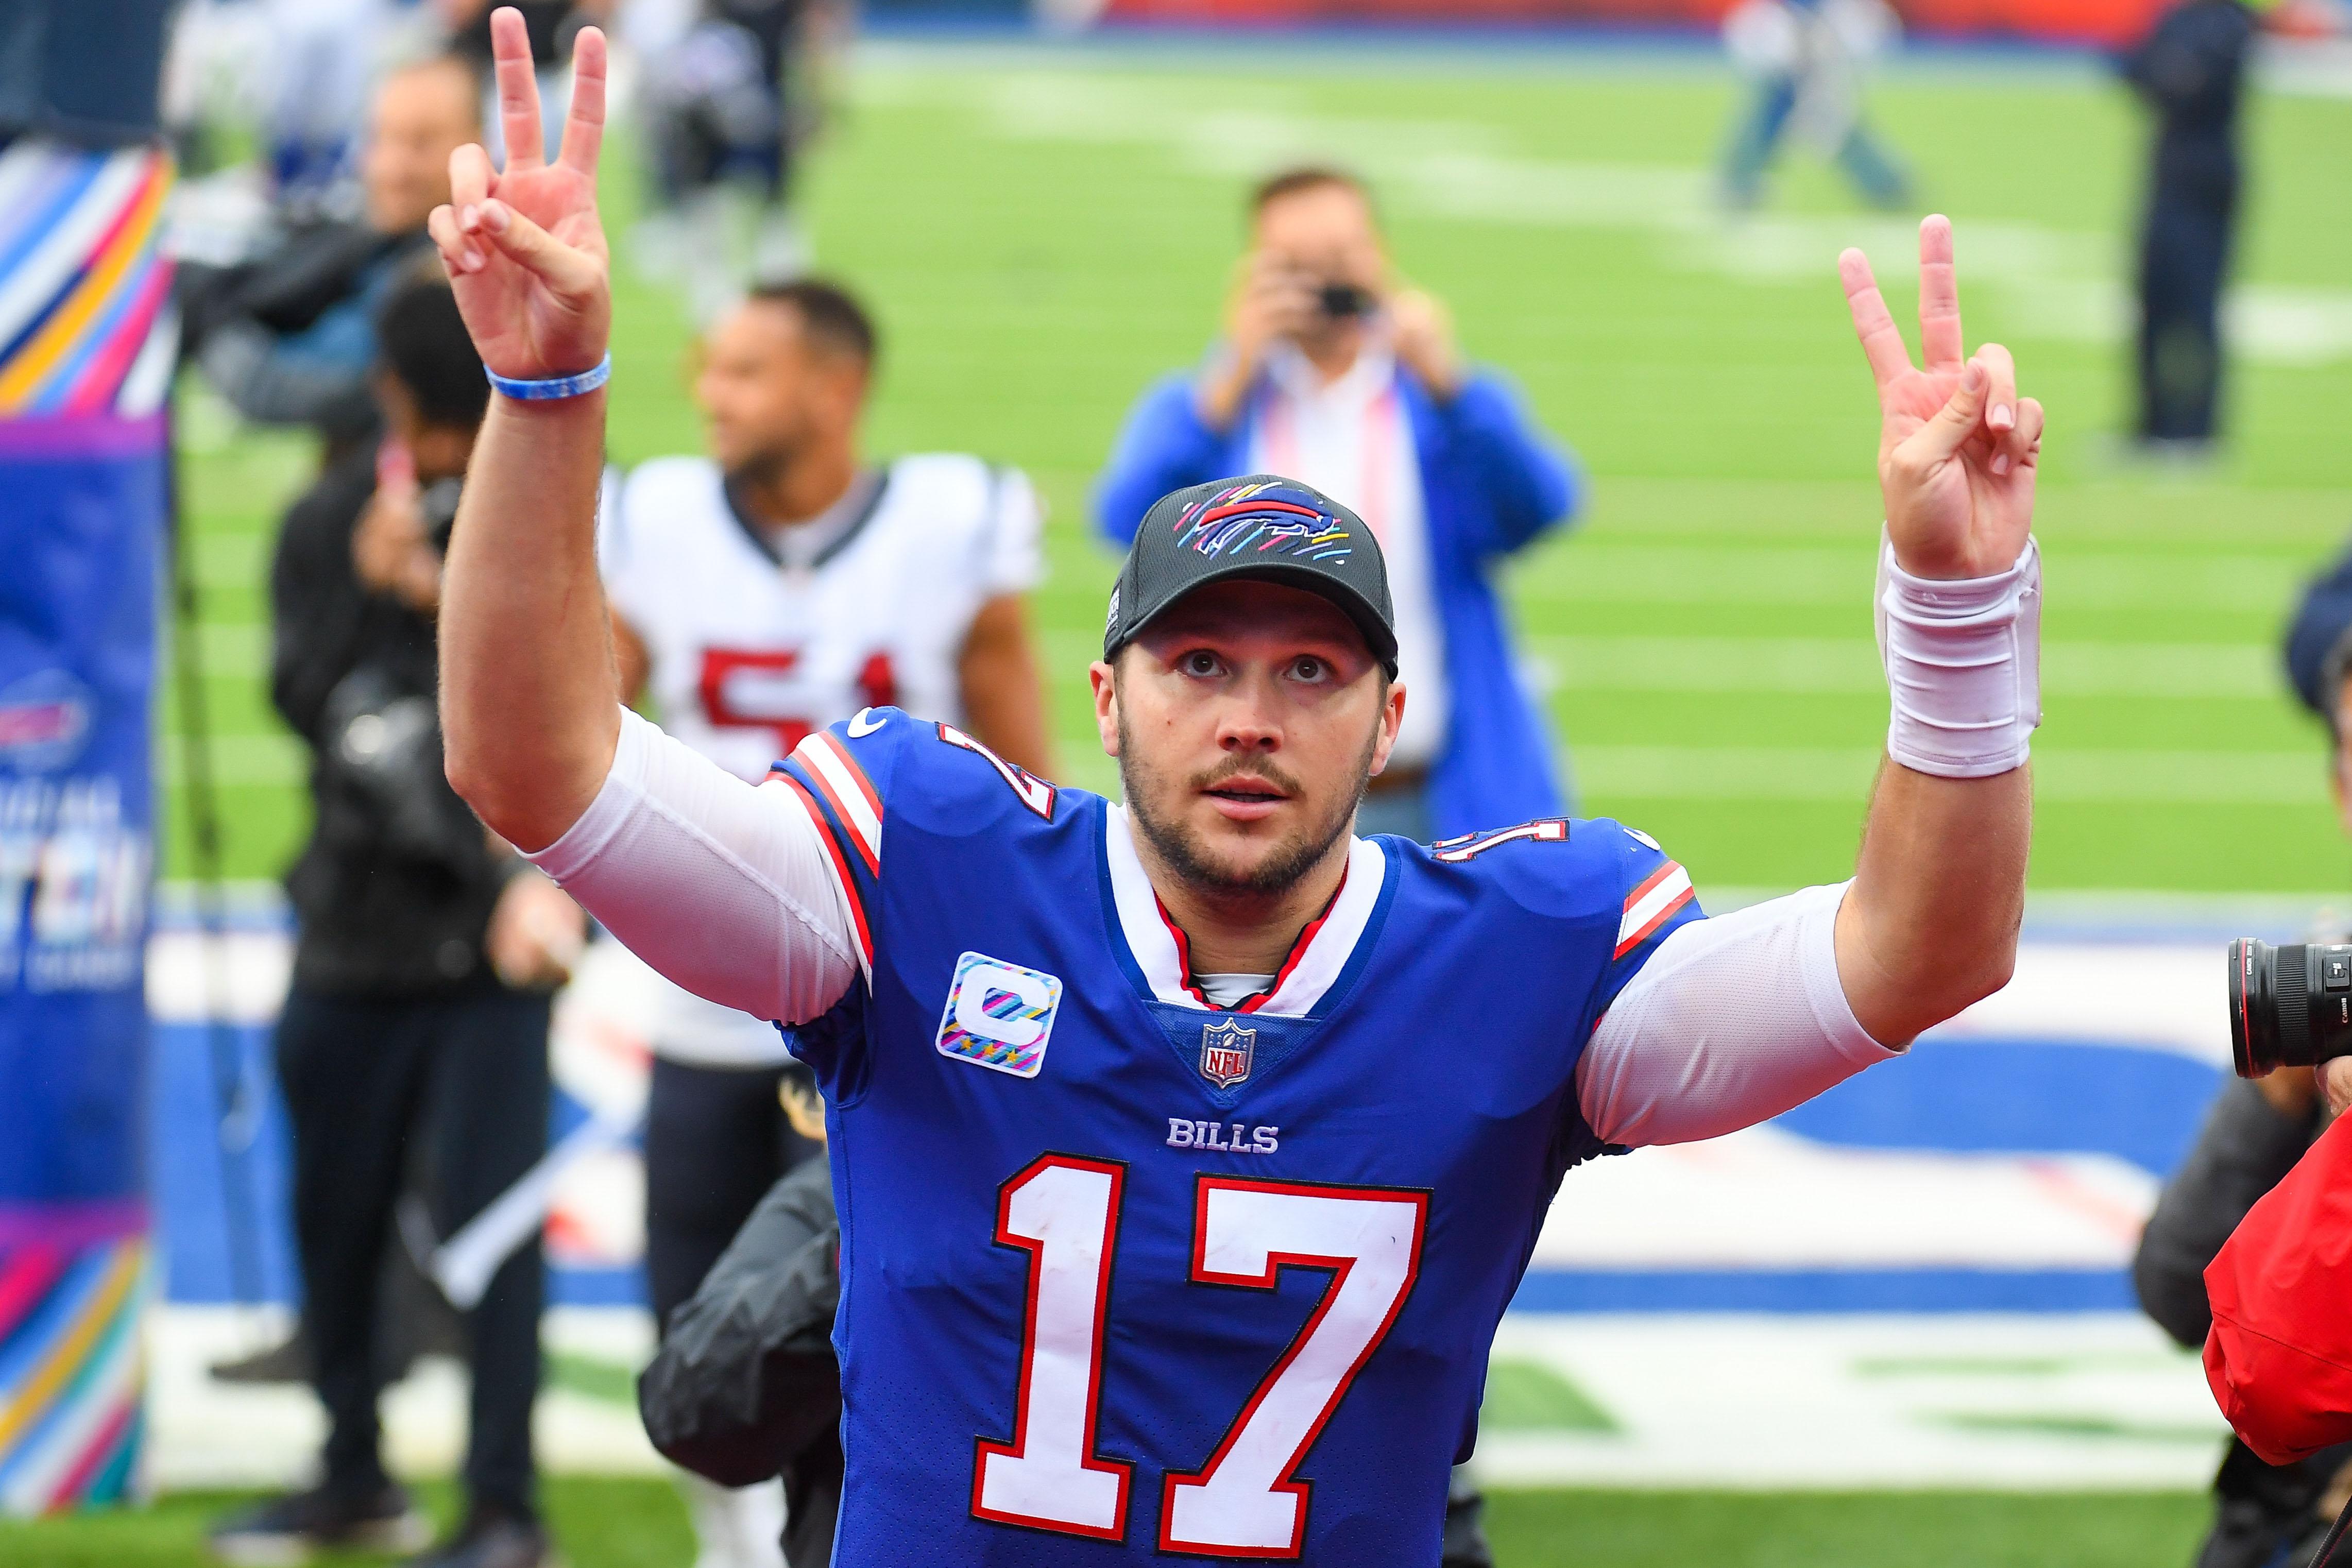 NFL: Houston Texans at Buffalo Bills